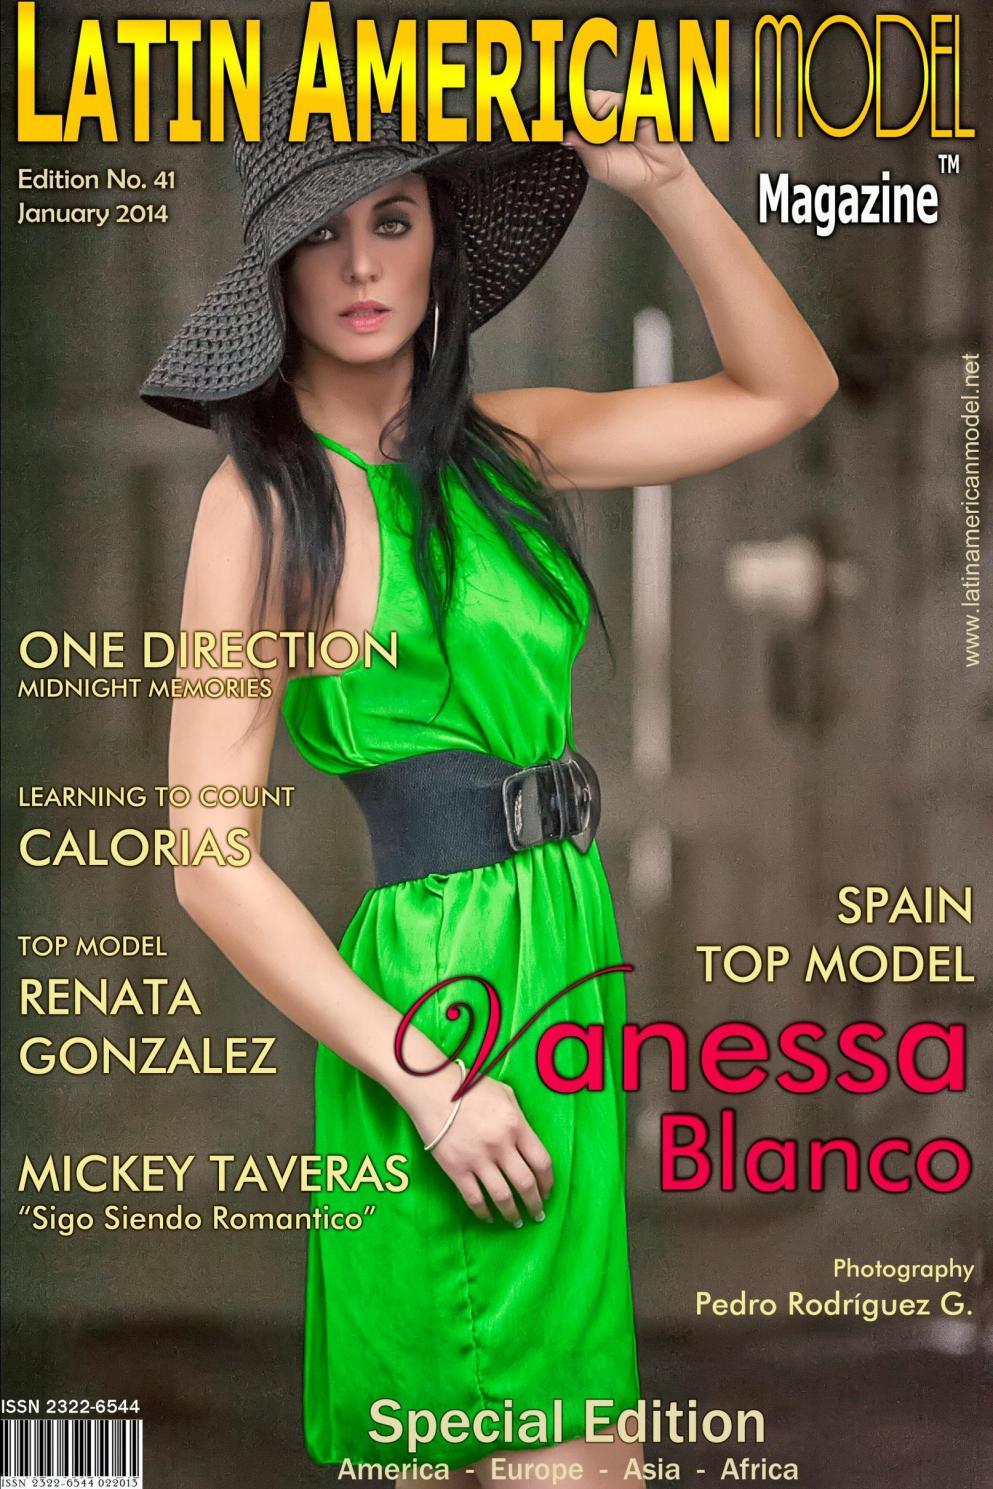 Glamour, Fashion & Beauty - Magazine LATIN AMERICAN MODEL by